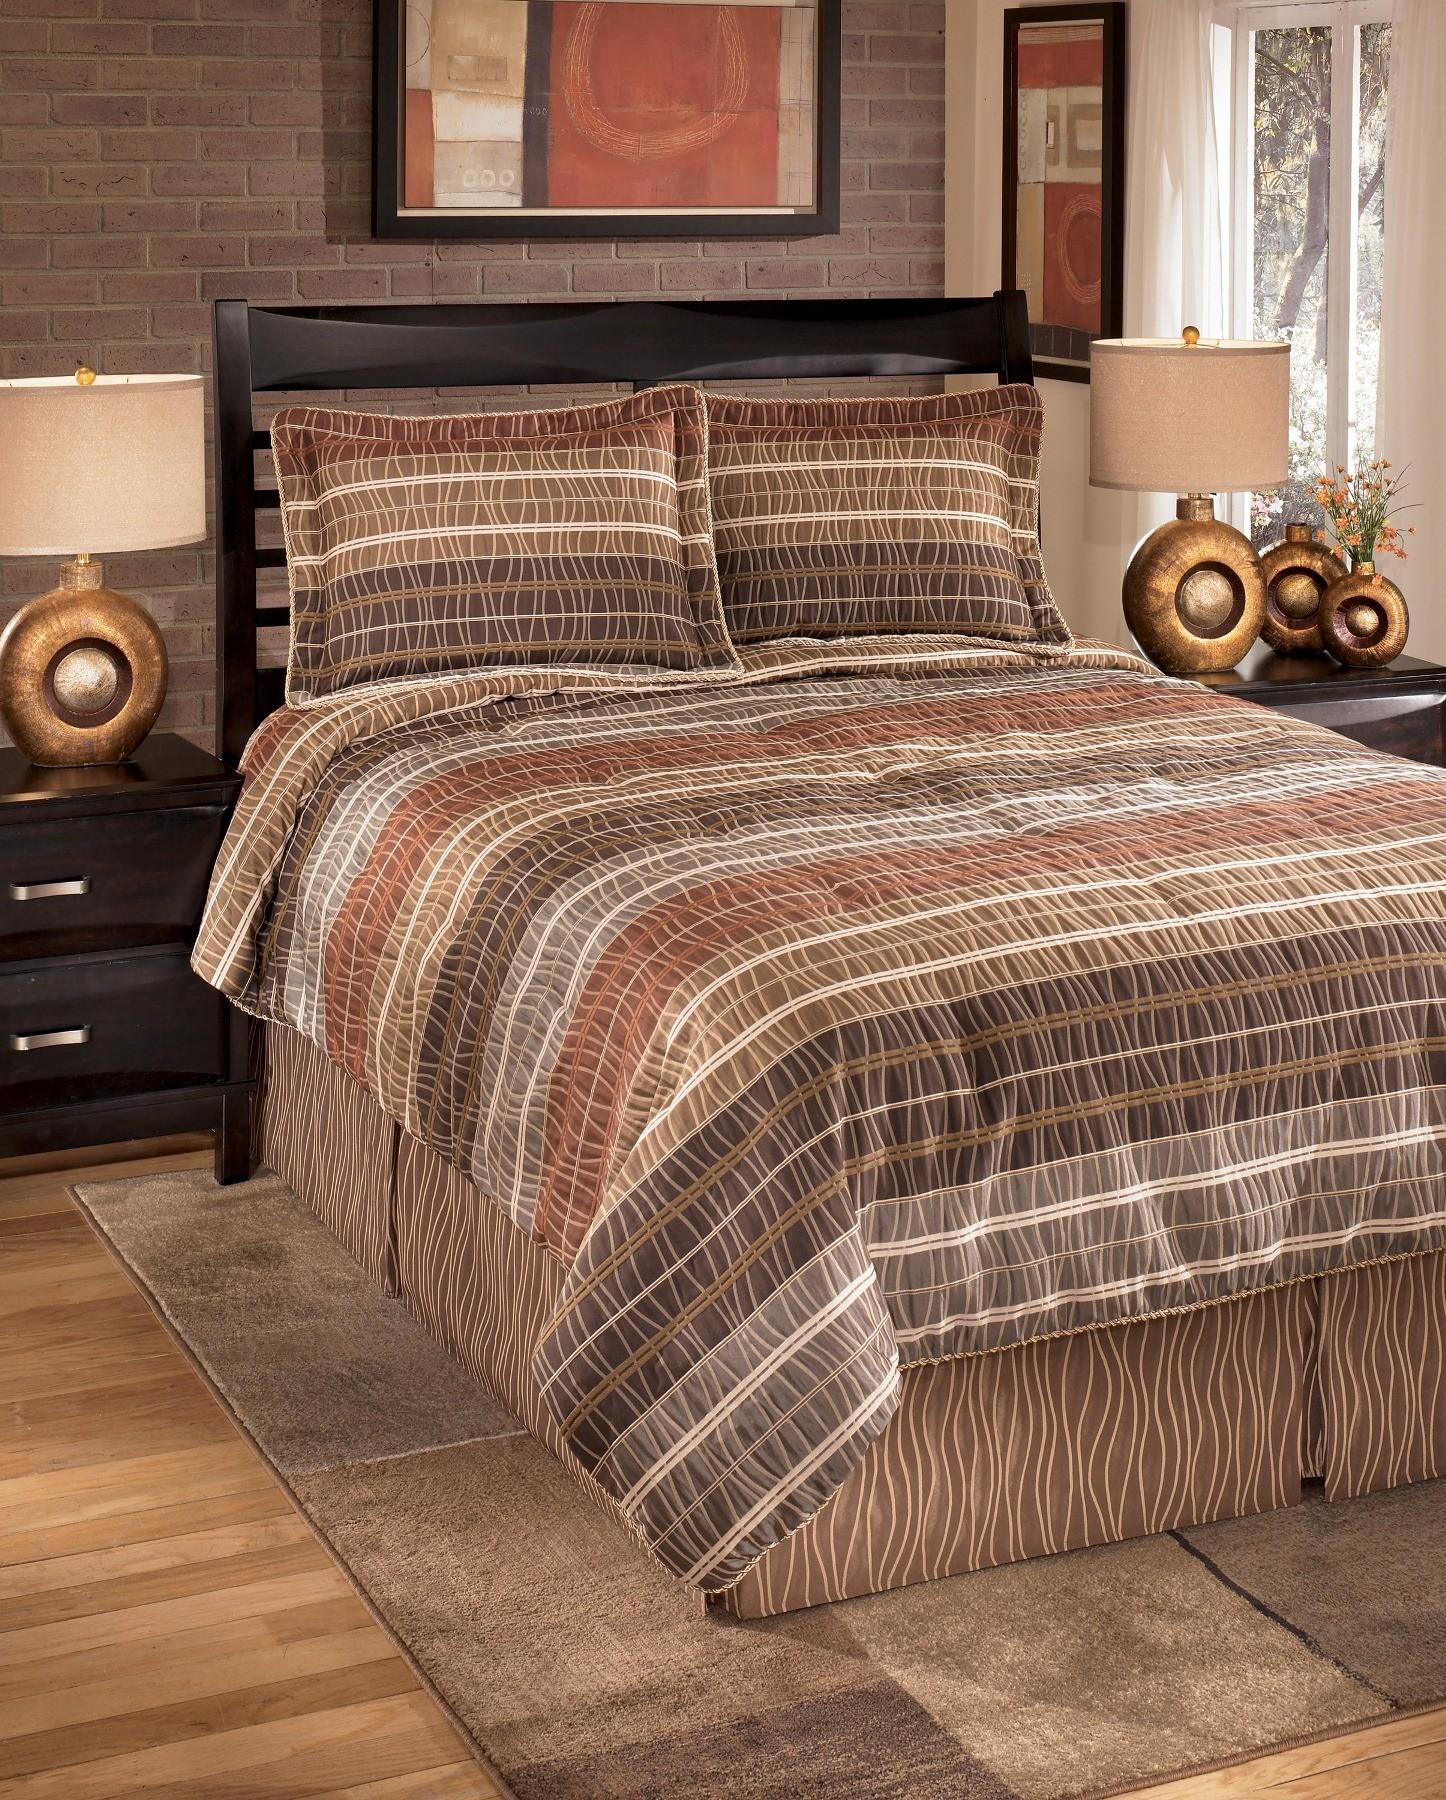 Wavelength Jewel Queen Bedding Set From Ashley Q033004q